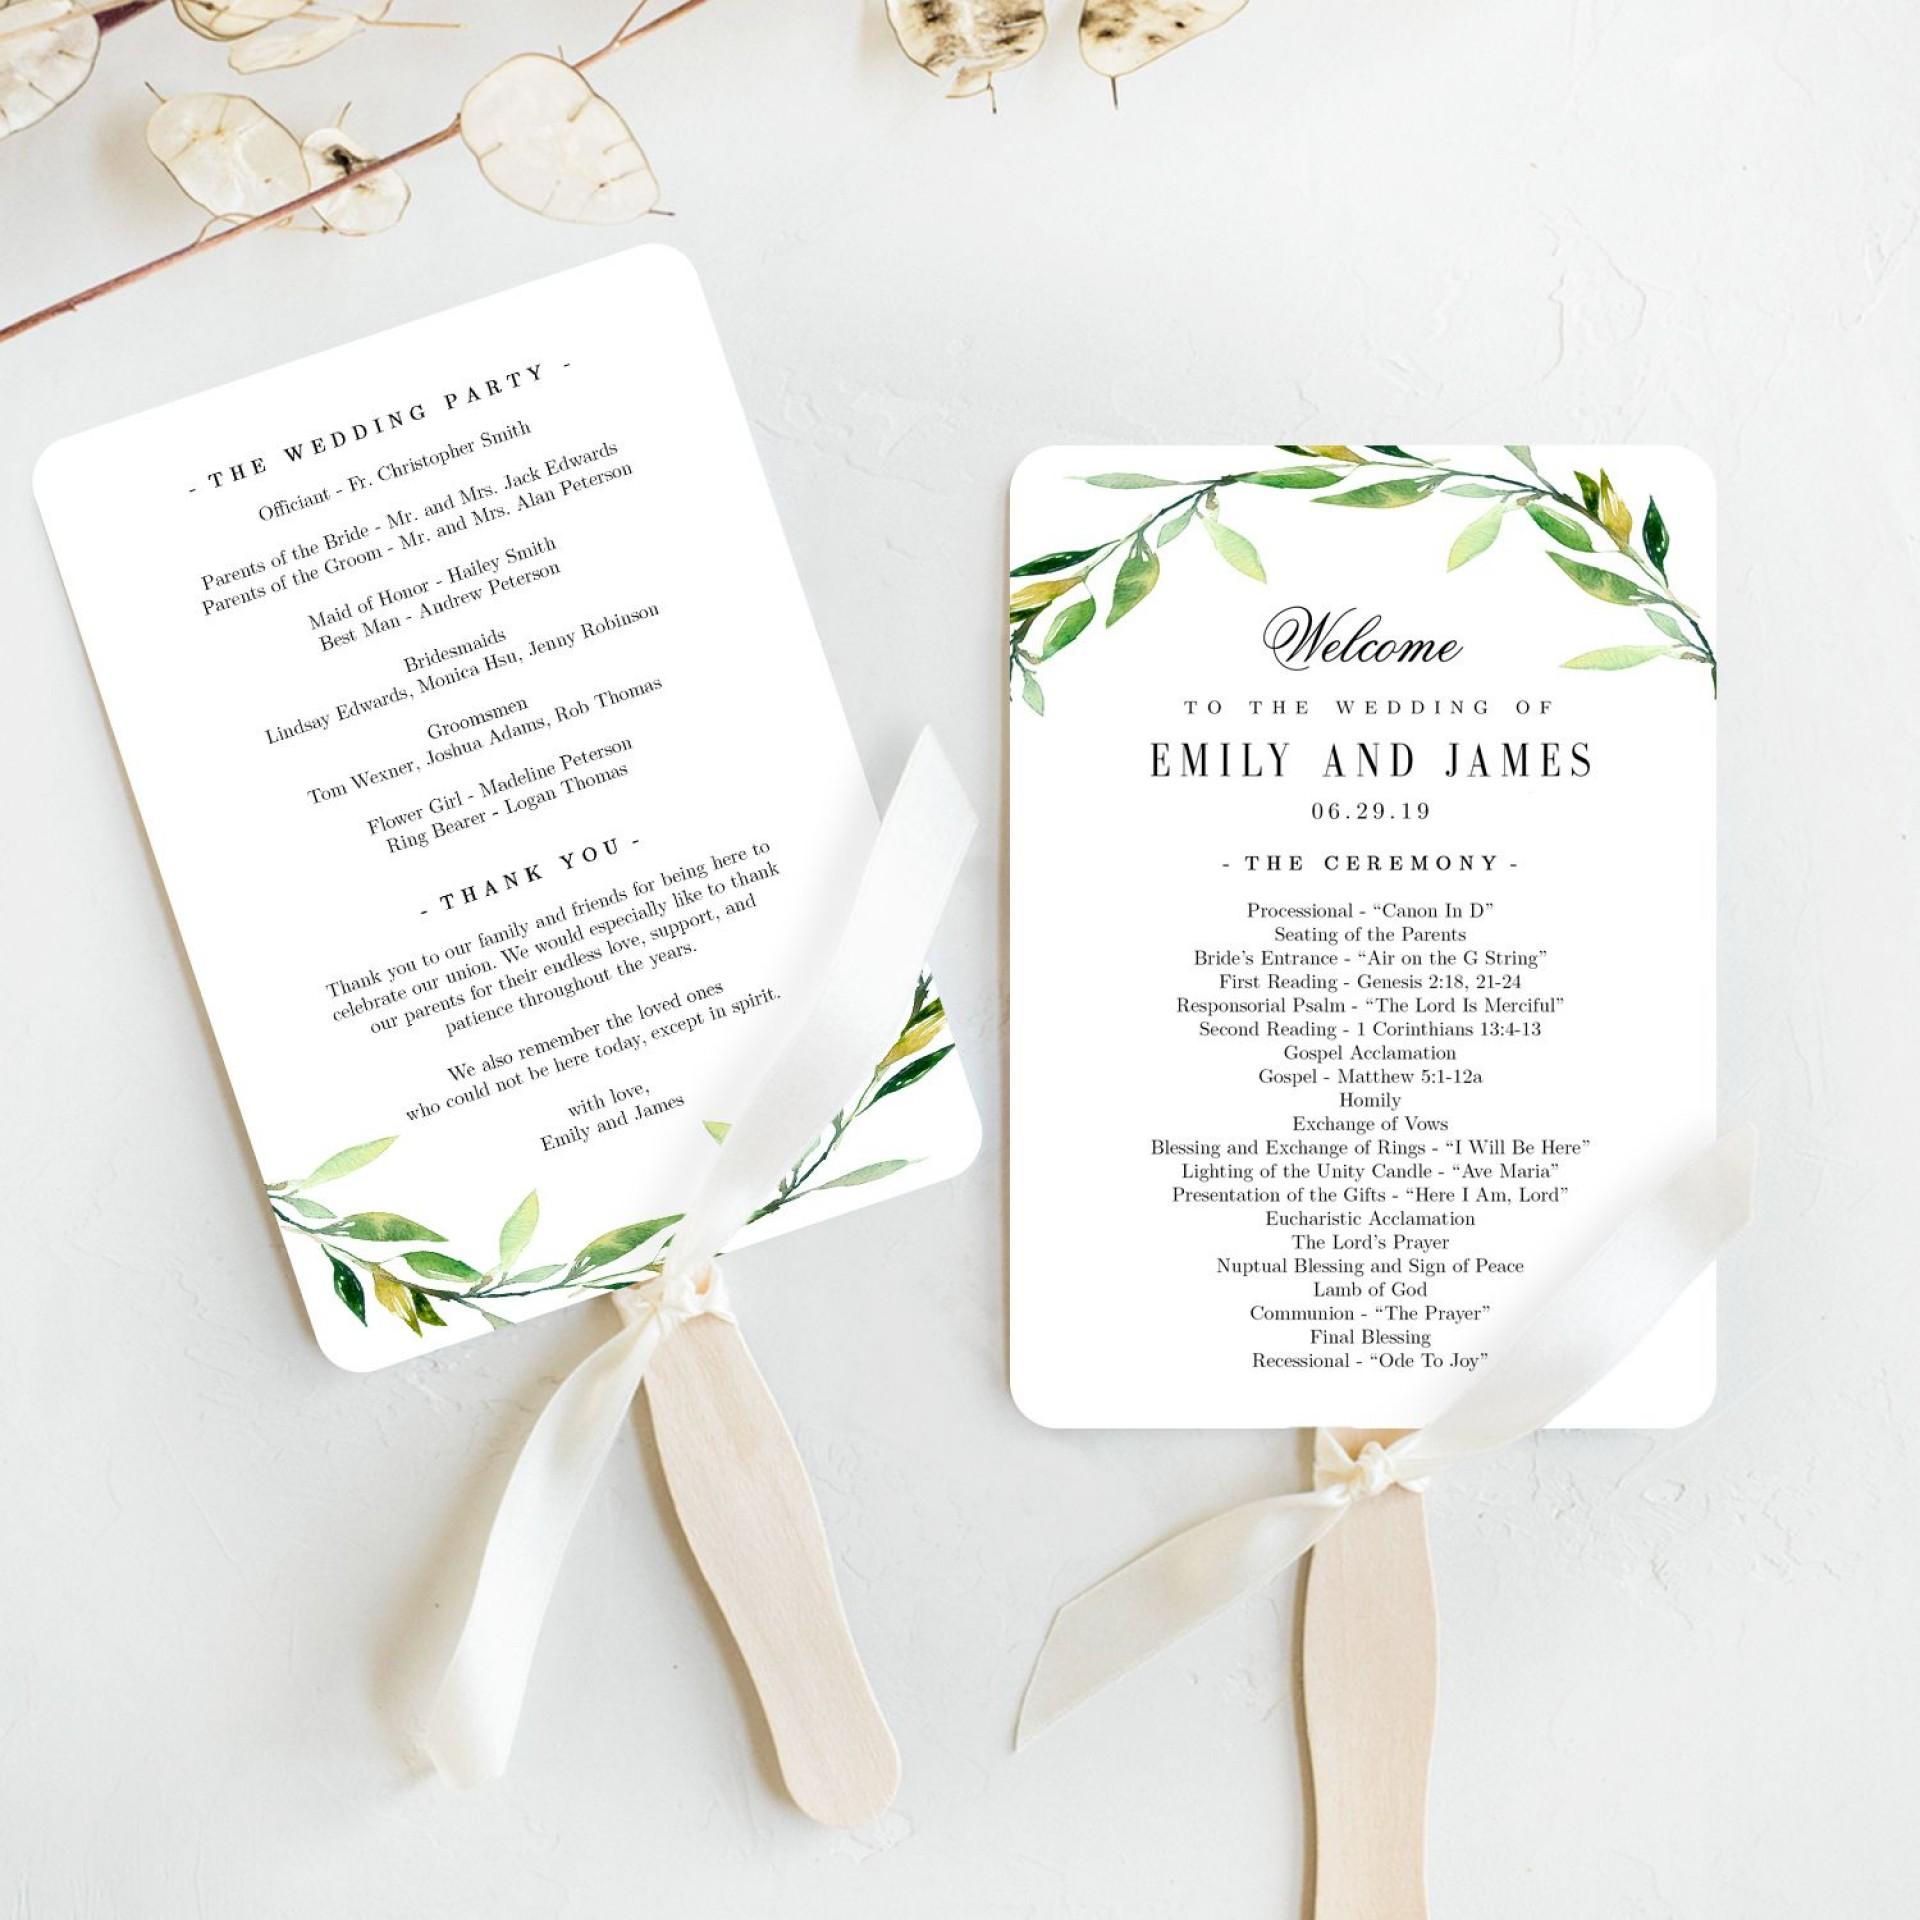 006 Fantastic Wedding Program Template Free Photo  Fan Download Elegant1920